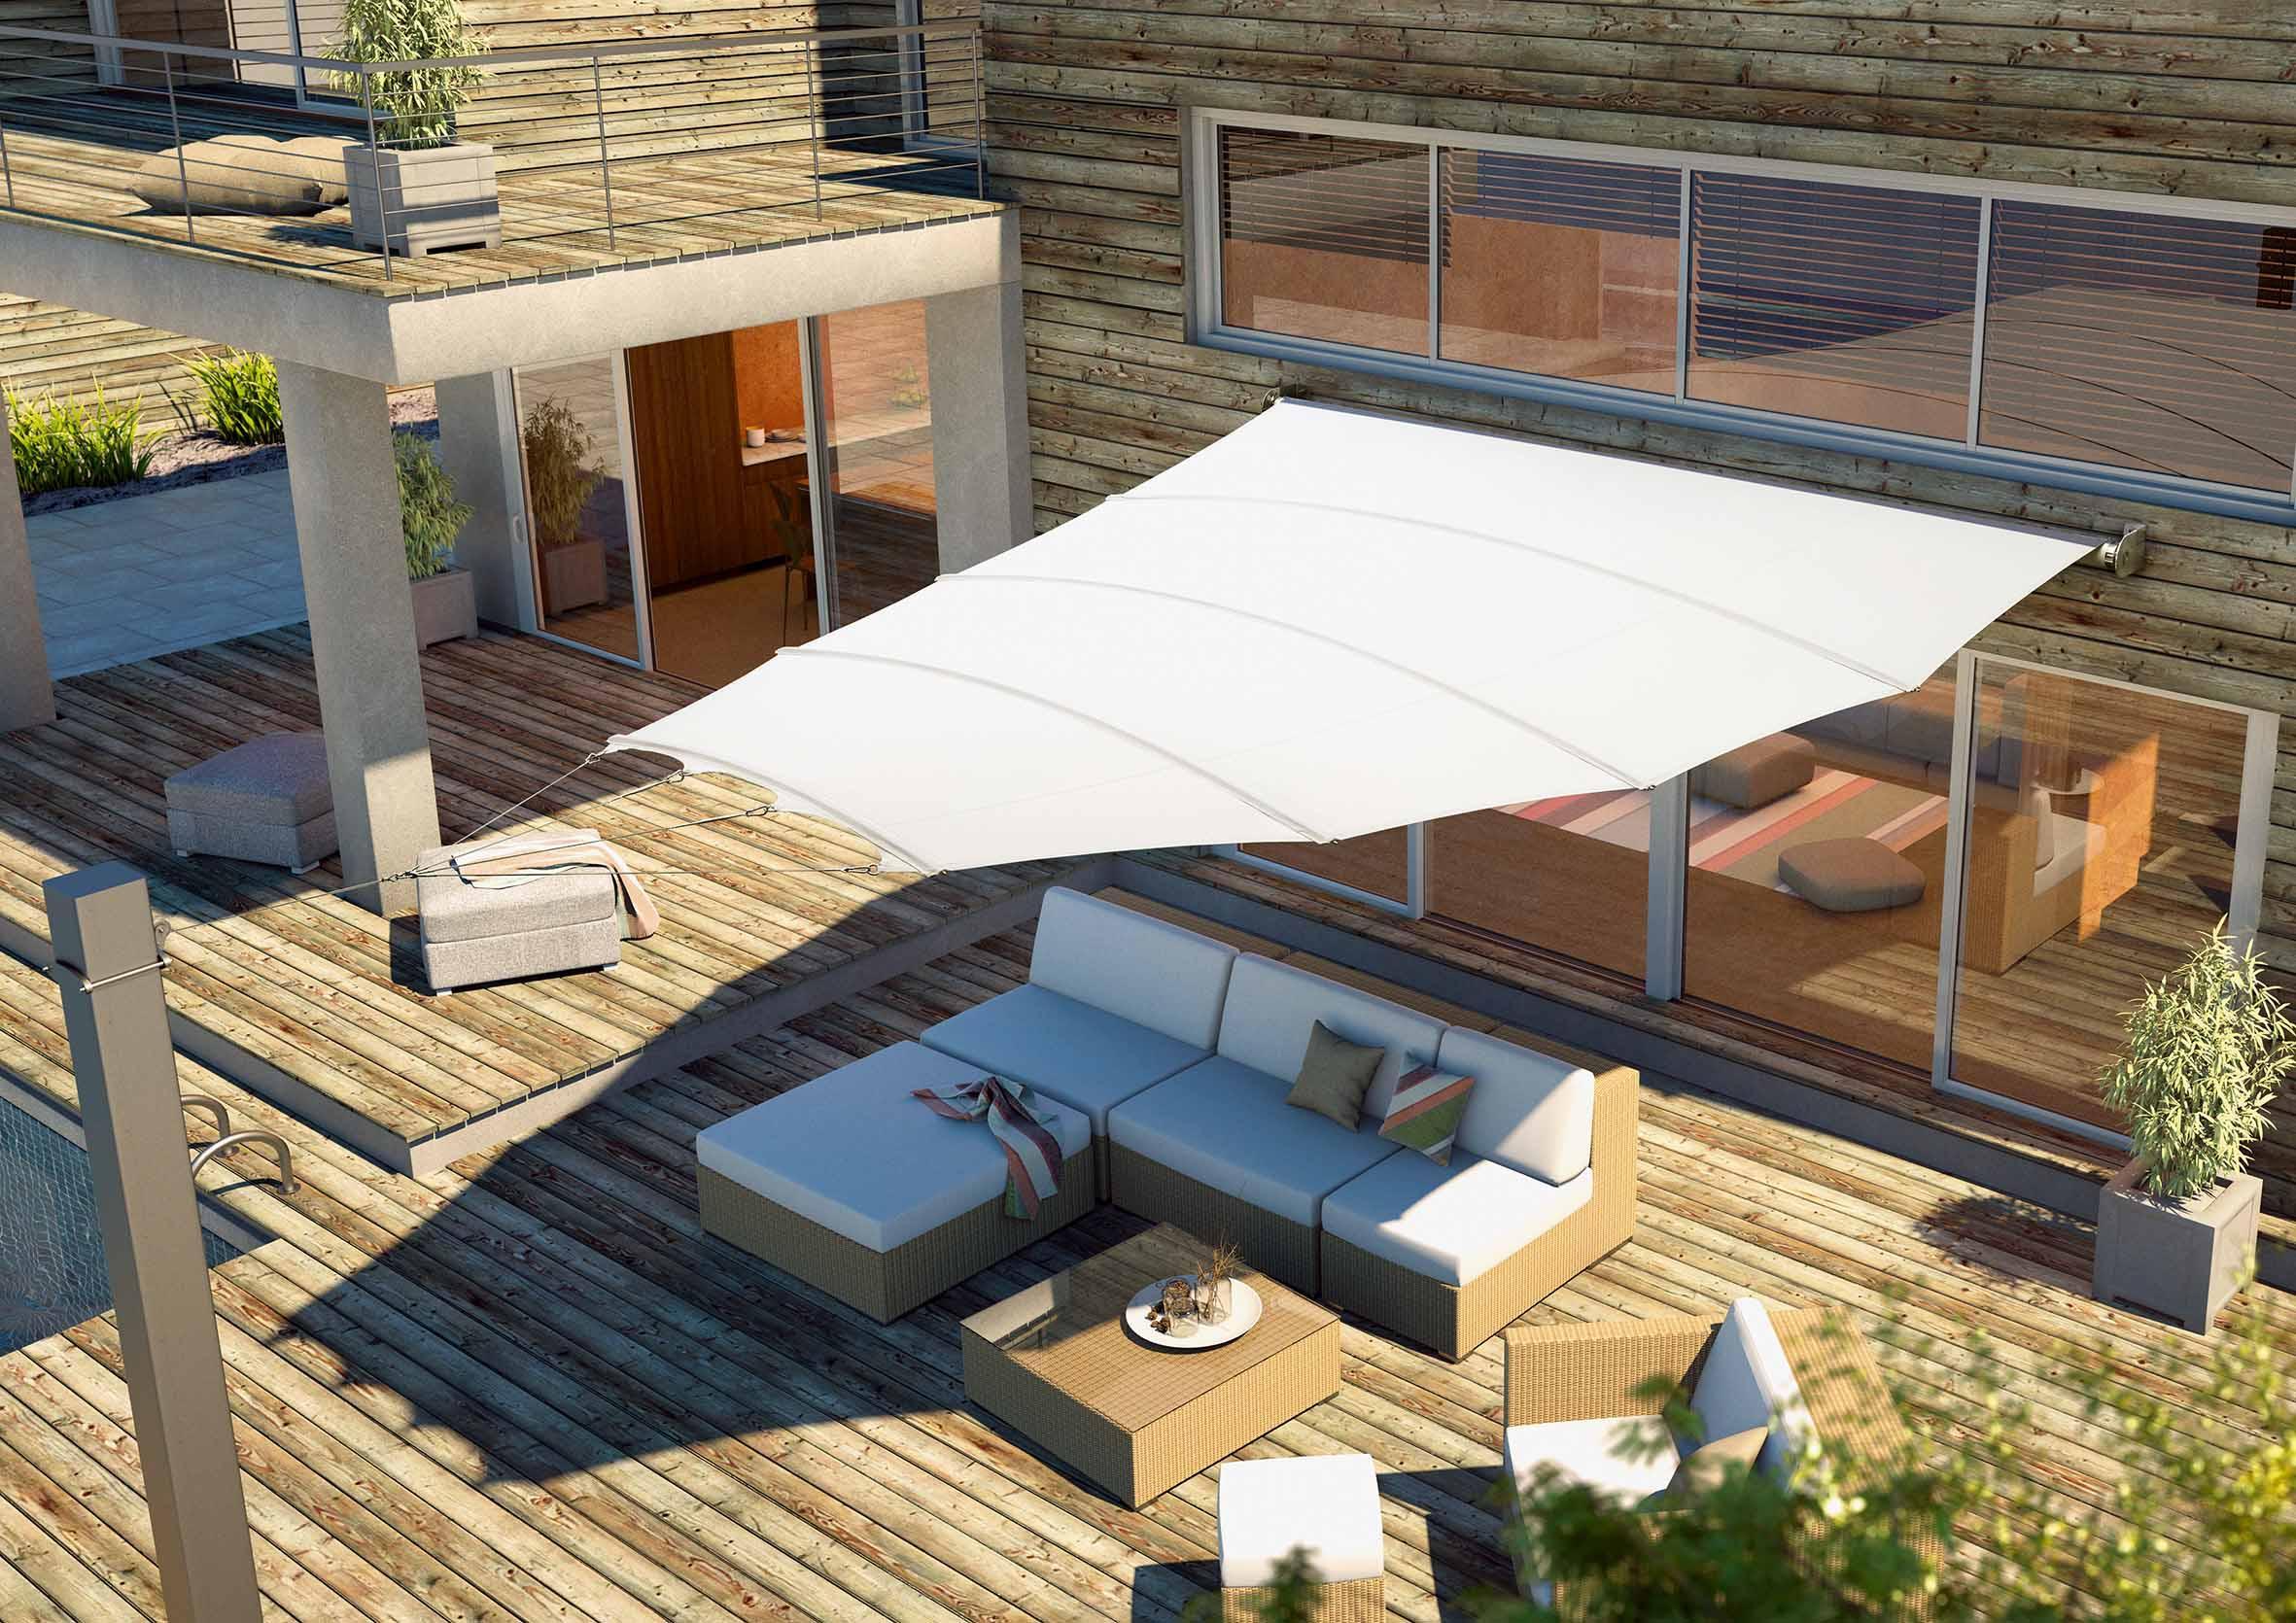 balkon sonnenschutz bilder ideen couch. Black Bedroom Furniture Sets. Home Design Ideas